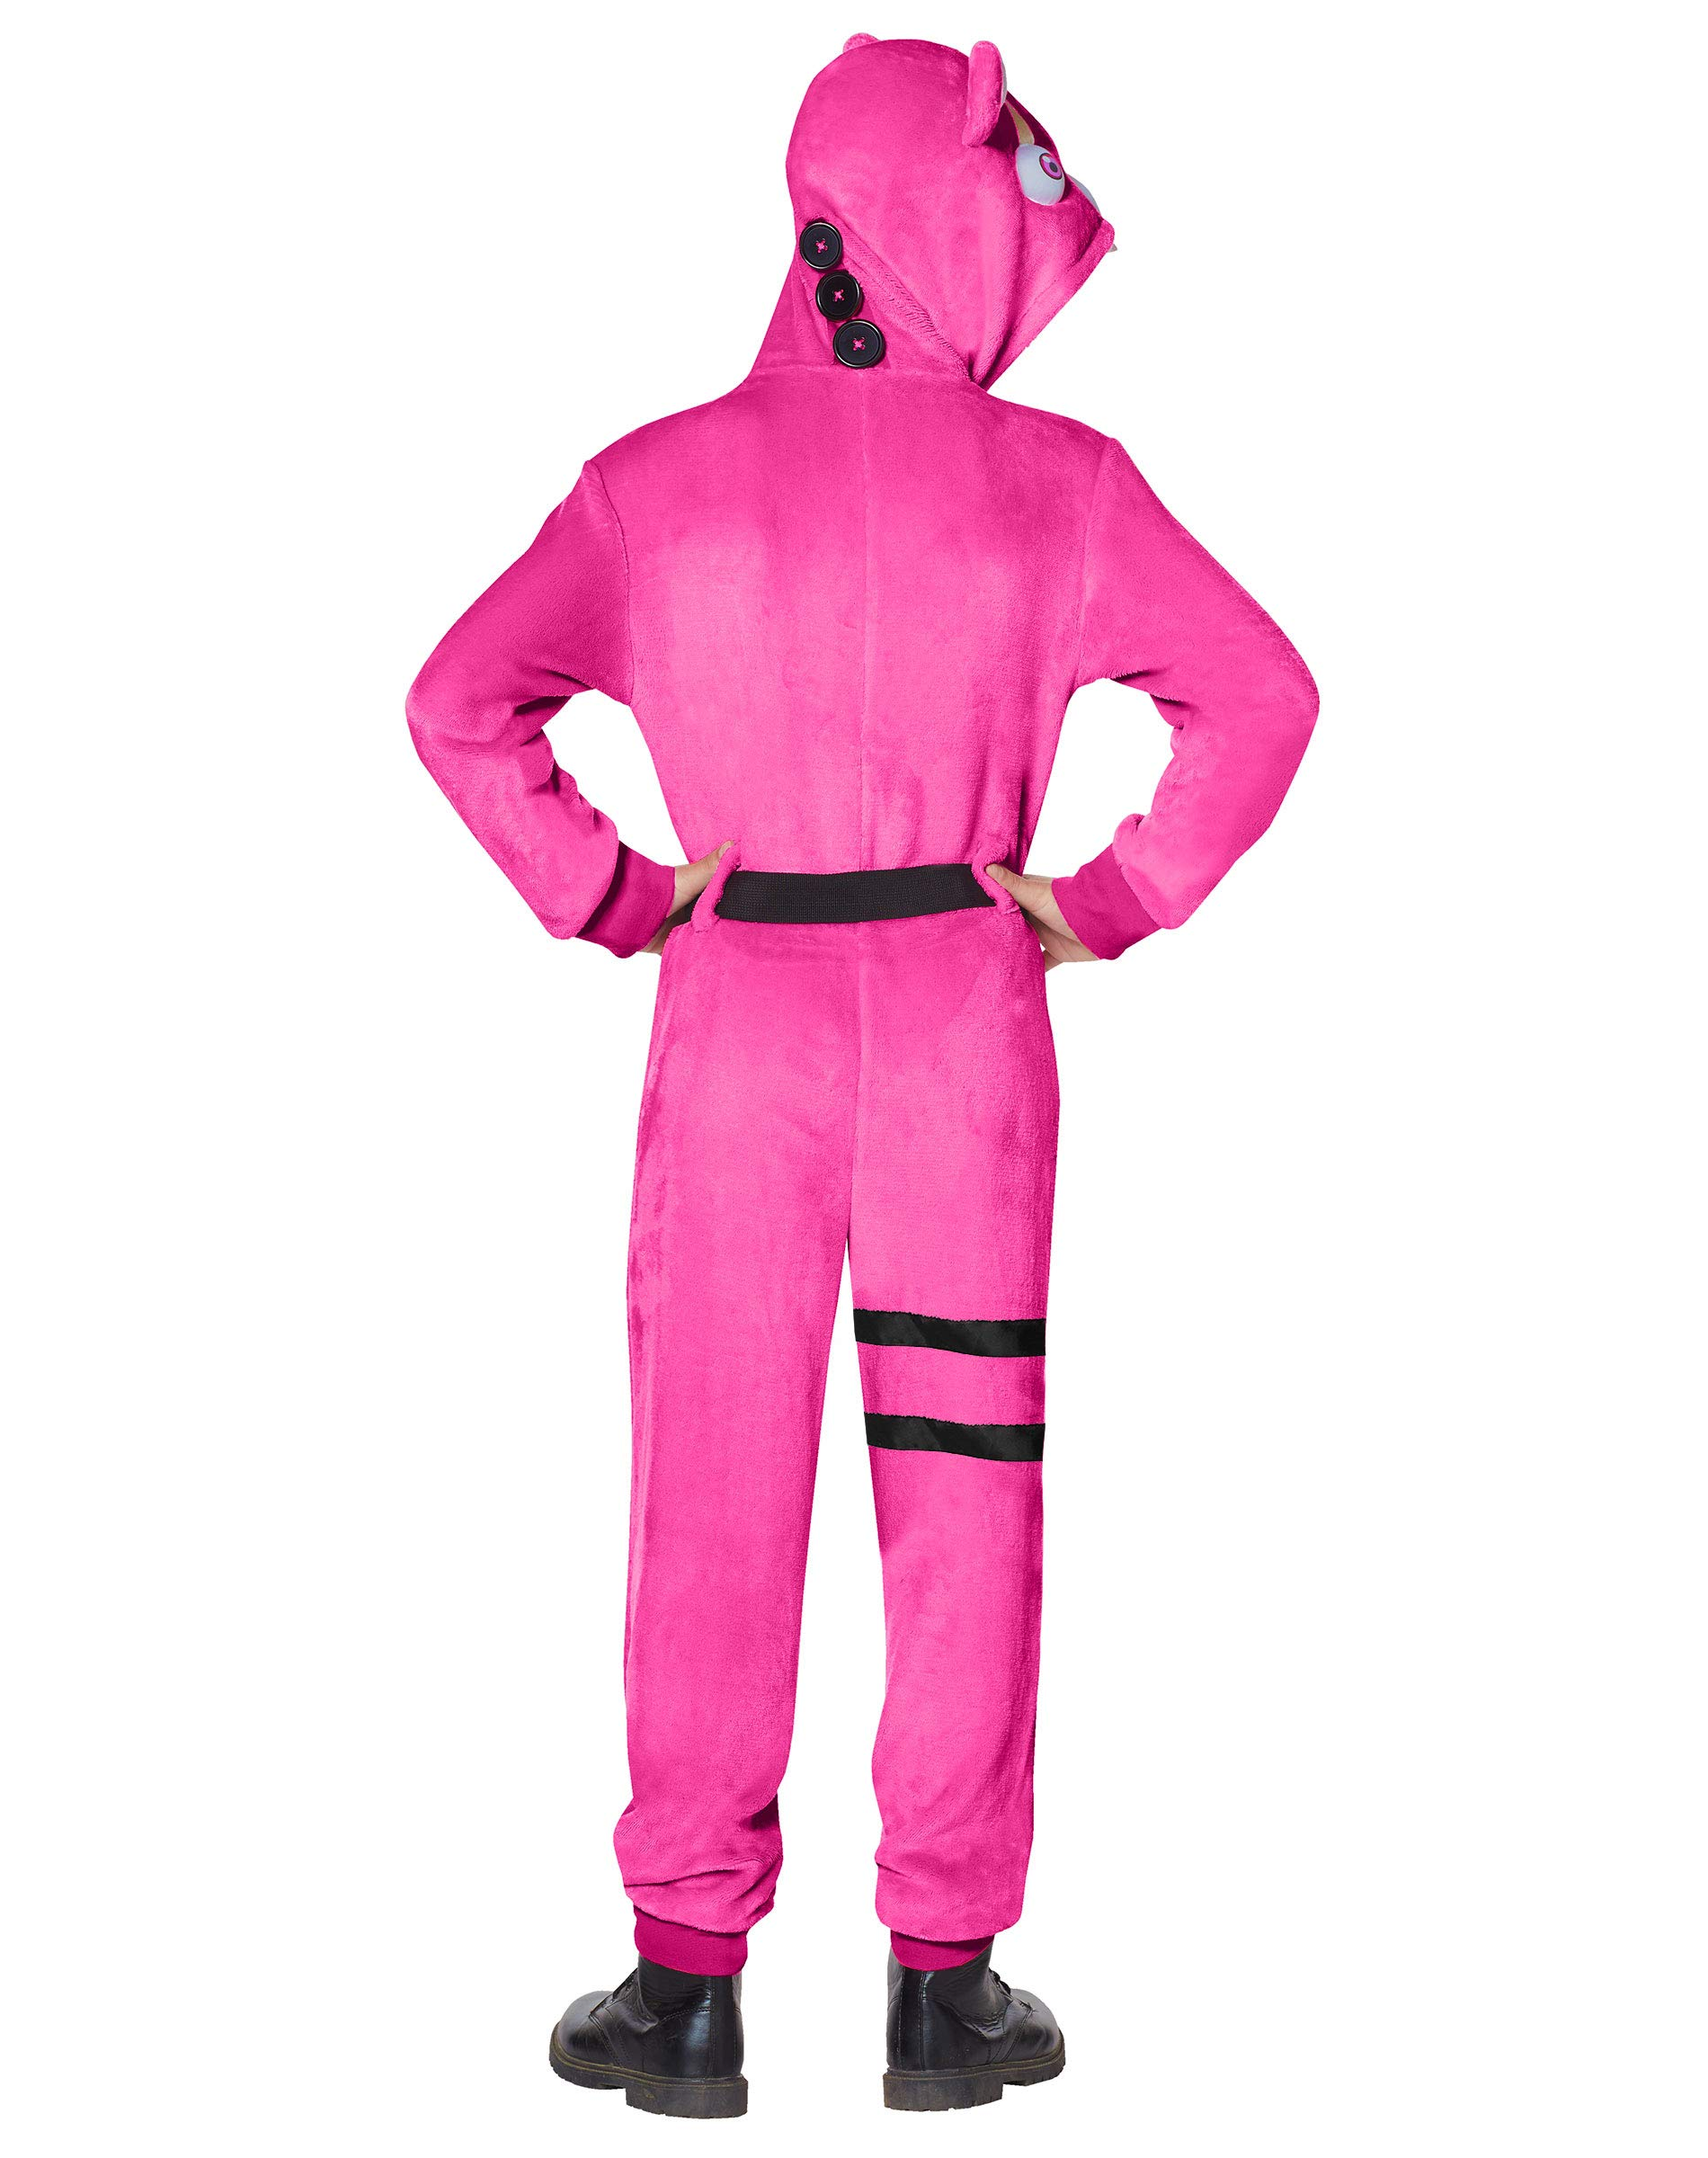 Spirit Halloween Kids Fortnite Plush Cuddle Team Leader Costume by Spirit Halloween (Image #4)